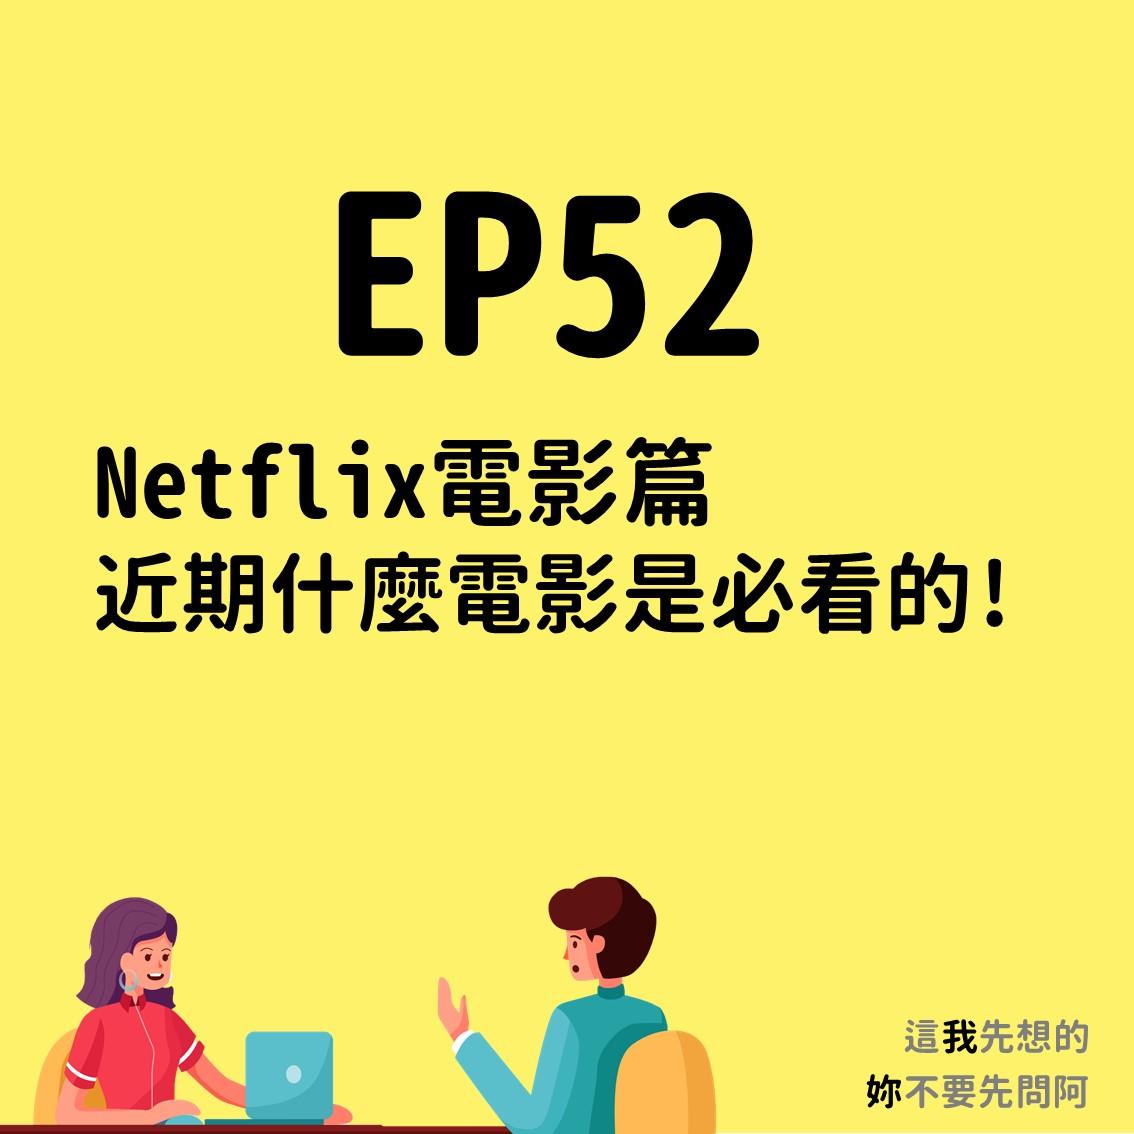 EP52 Netflix電影篇 近期什麼電影是必看的!